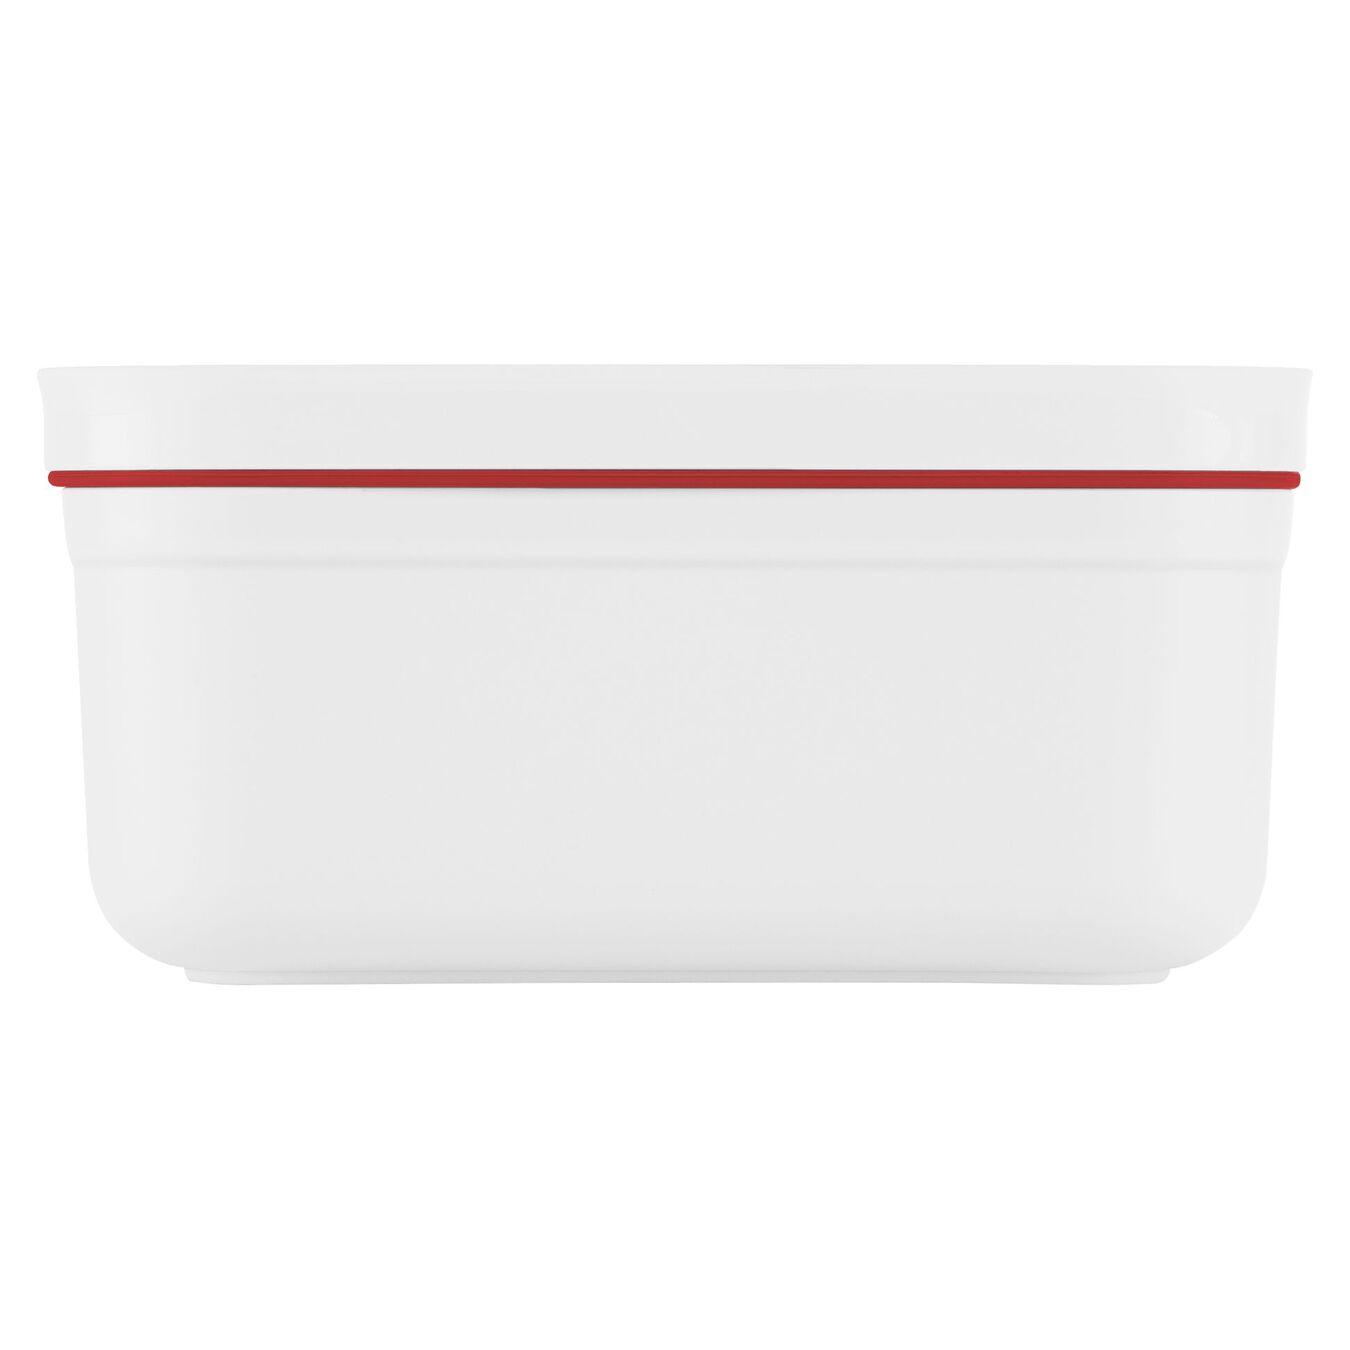 Vakuum Lunchbox, S, Kunststoff, Weiß-Rot,,large 3